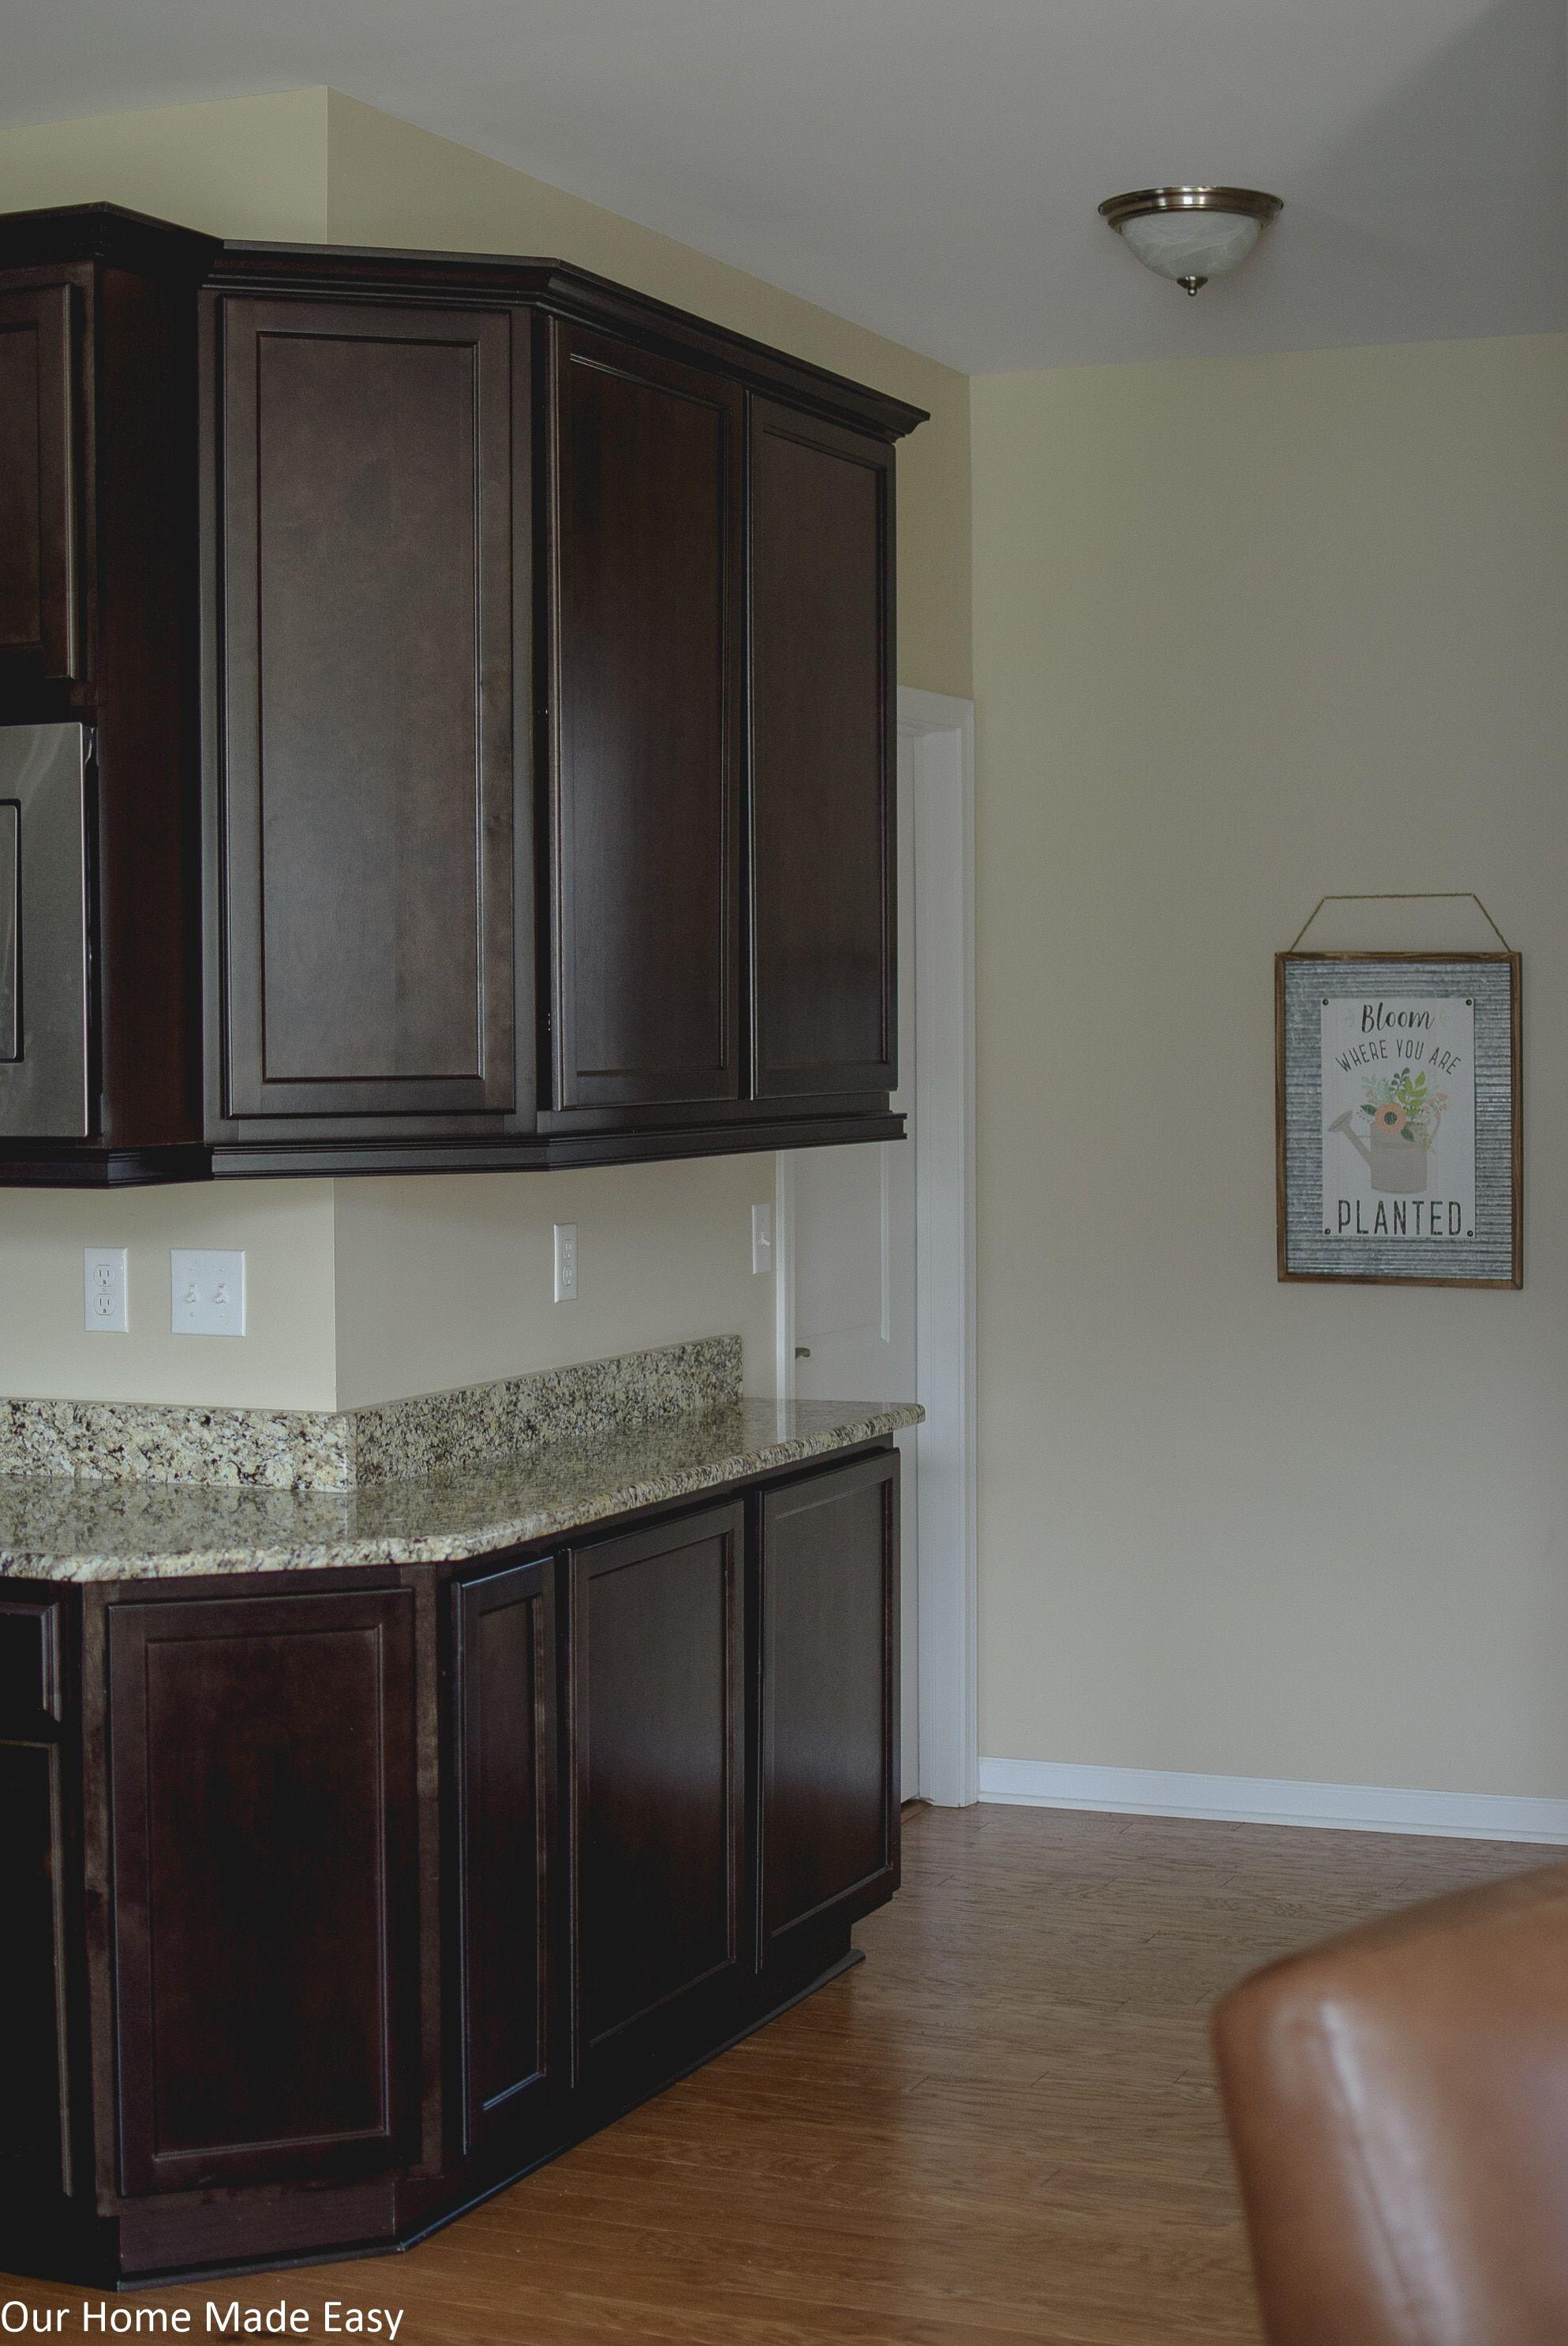 The Simplest Way to Clean Kitchen Clean kitchen